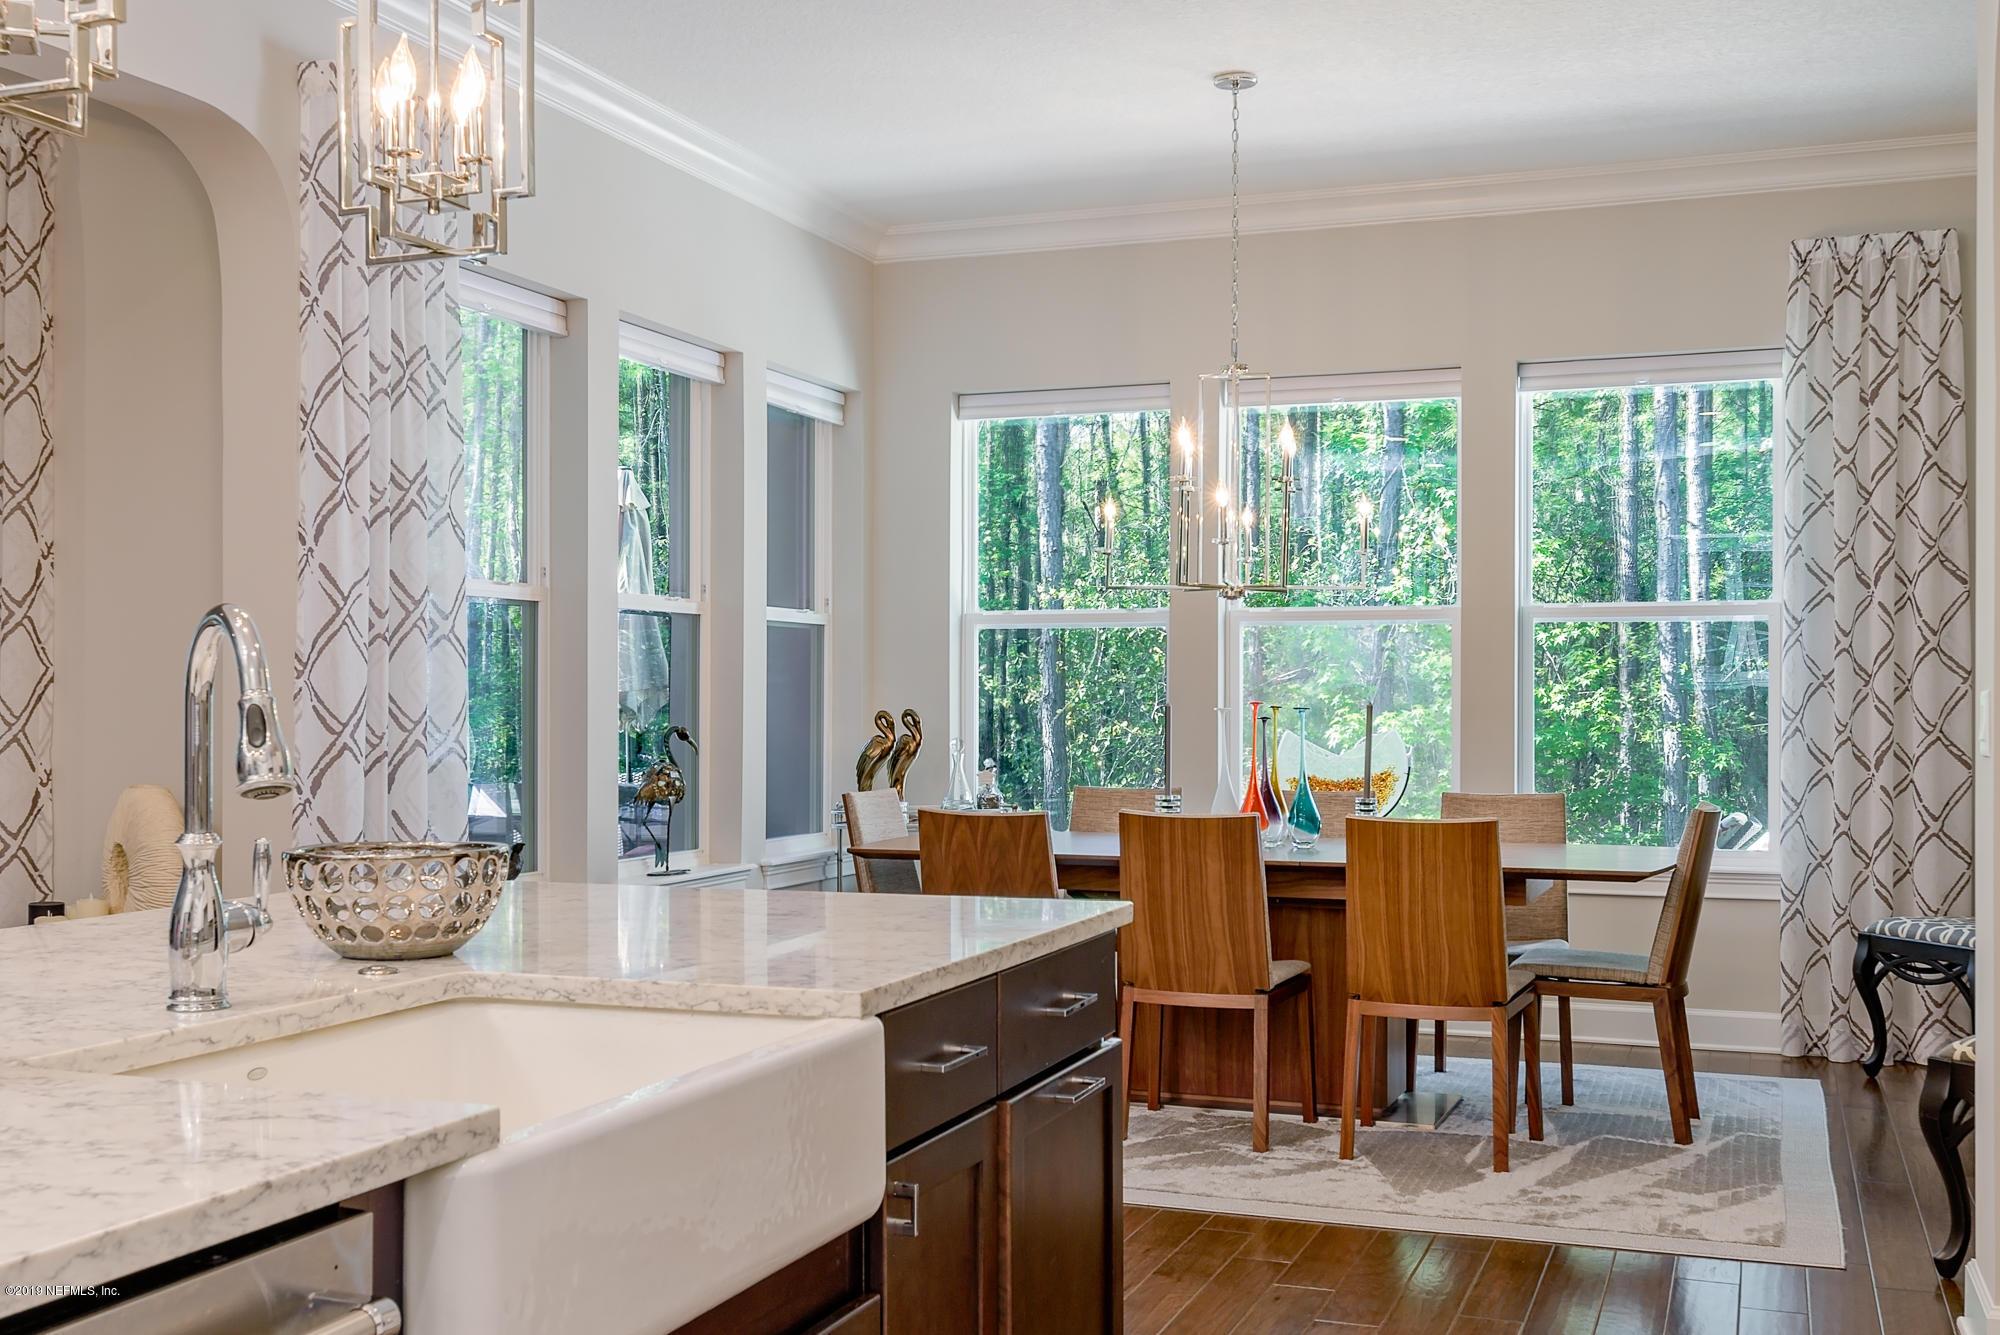 112 SITARA, ST JOHNS, FLORIDA 32259, 4 Bedrooms Bedrooms, ,3 BathroomsBathrooms,Residential - single family,For sale,SITARA,984644